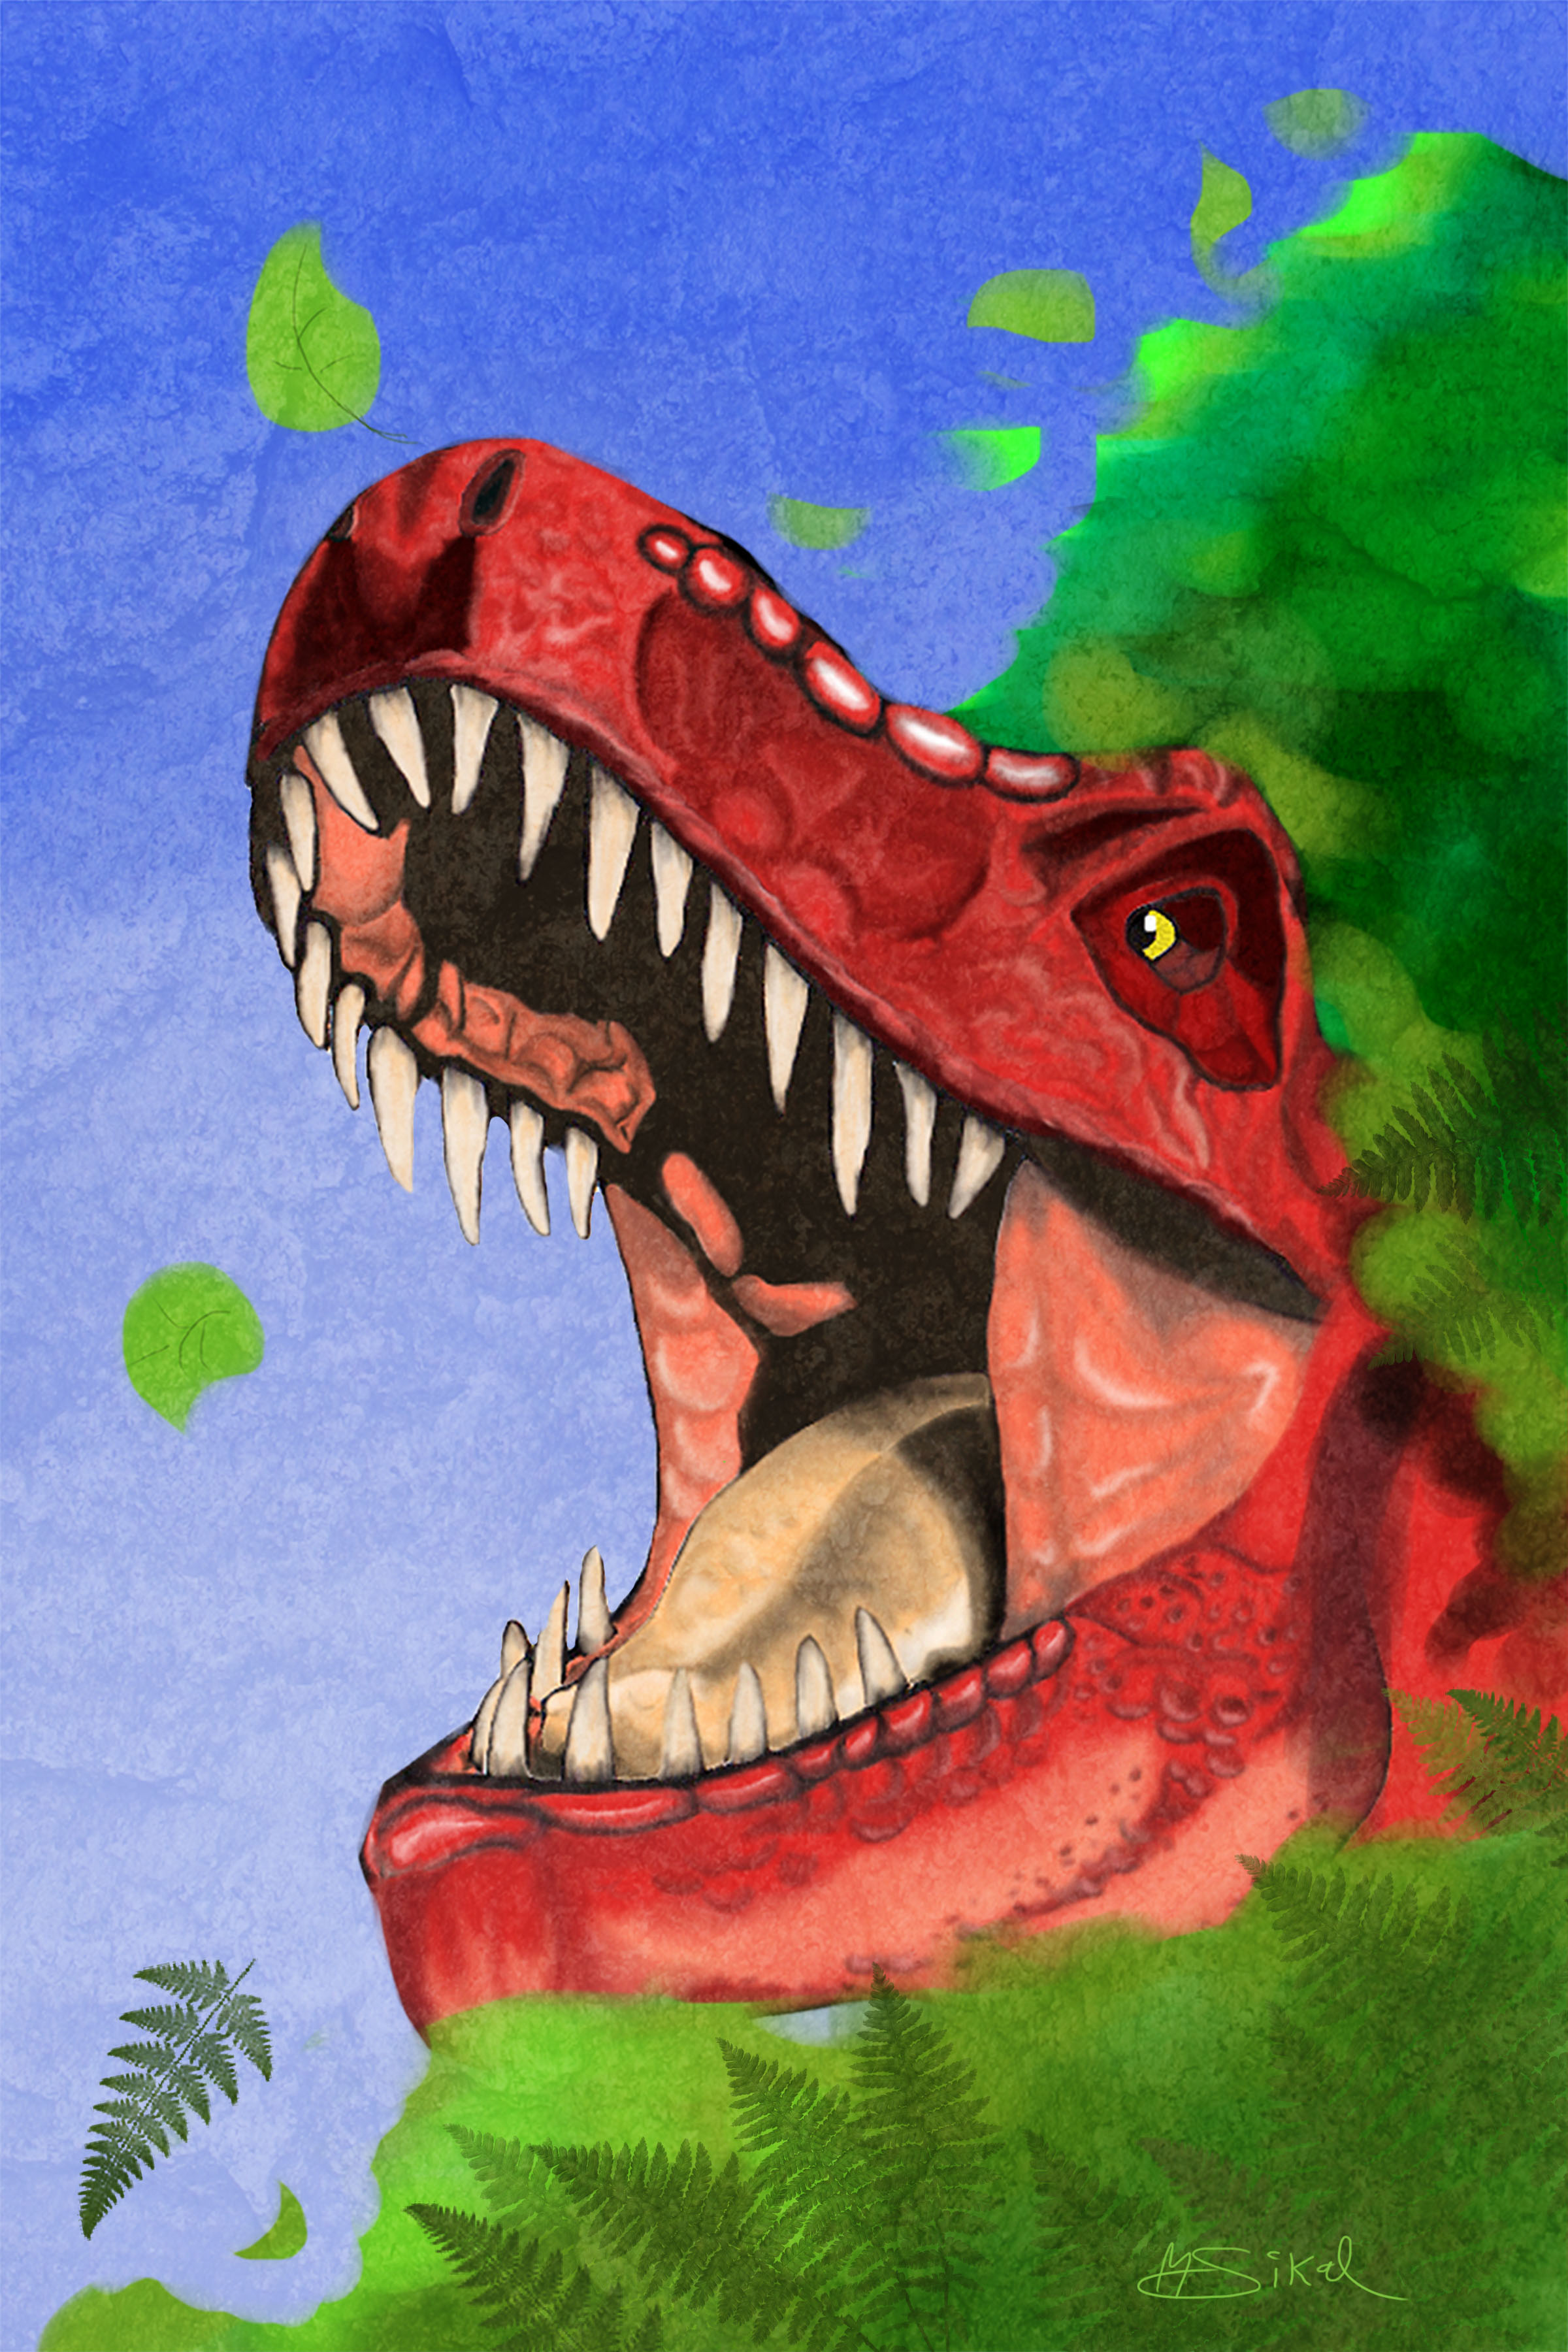 A Dinosaur's Life: Part 2